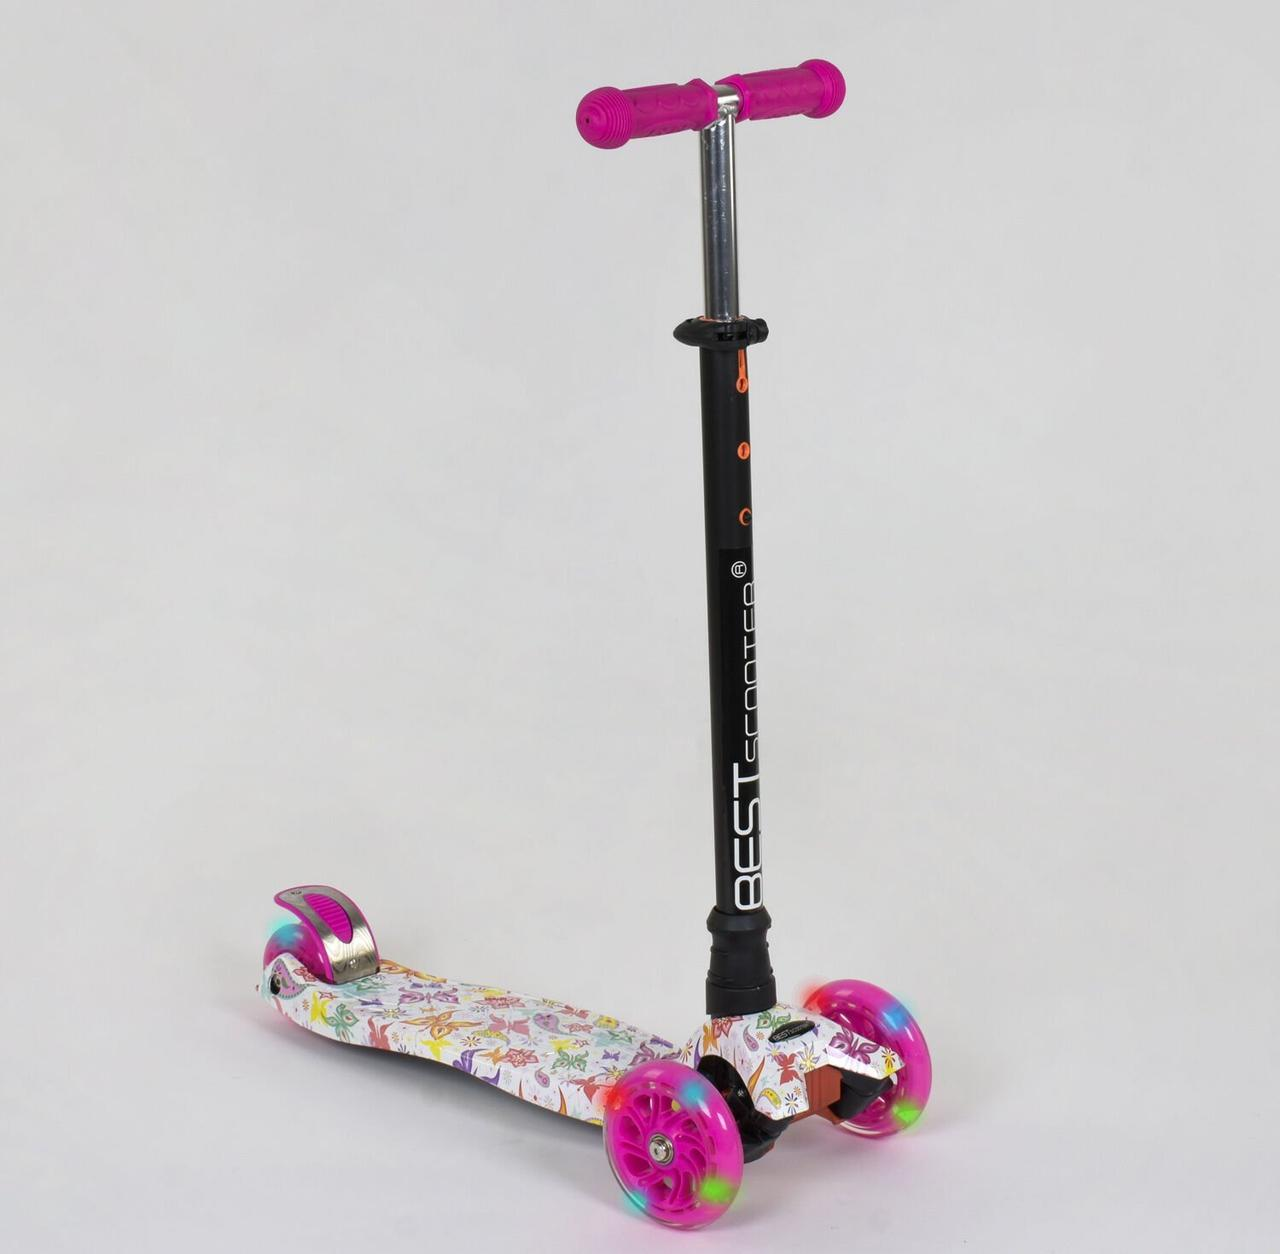 779-1336 Самокат Best Scooter MAXI Бабочки для девочки